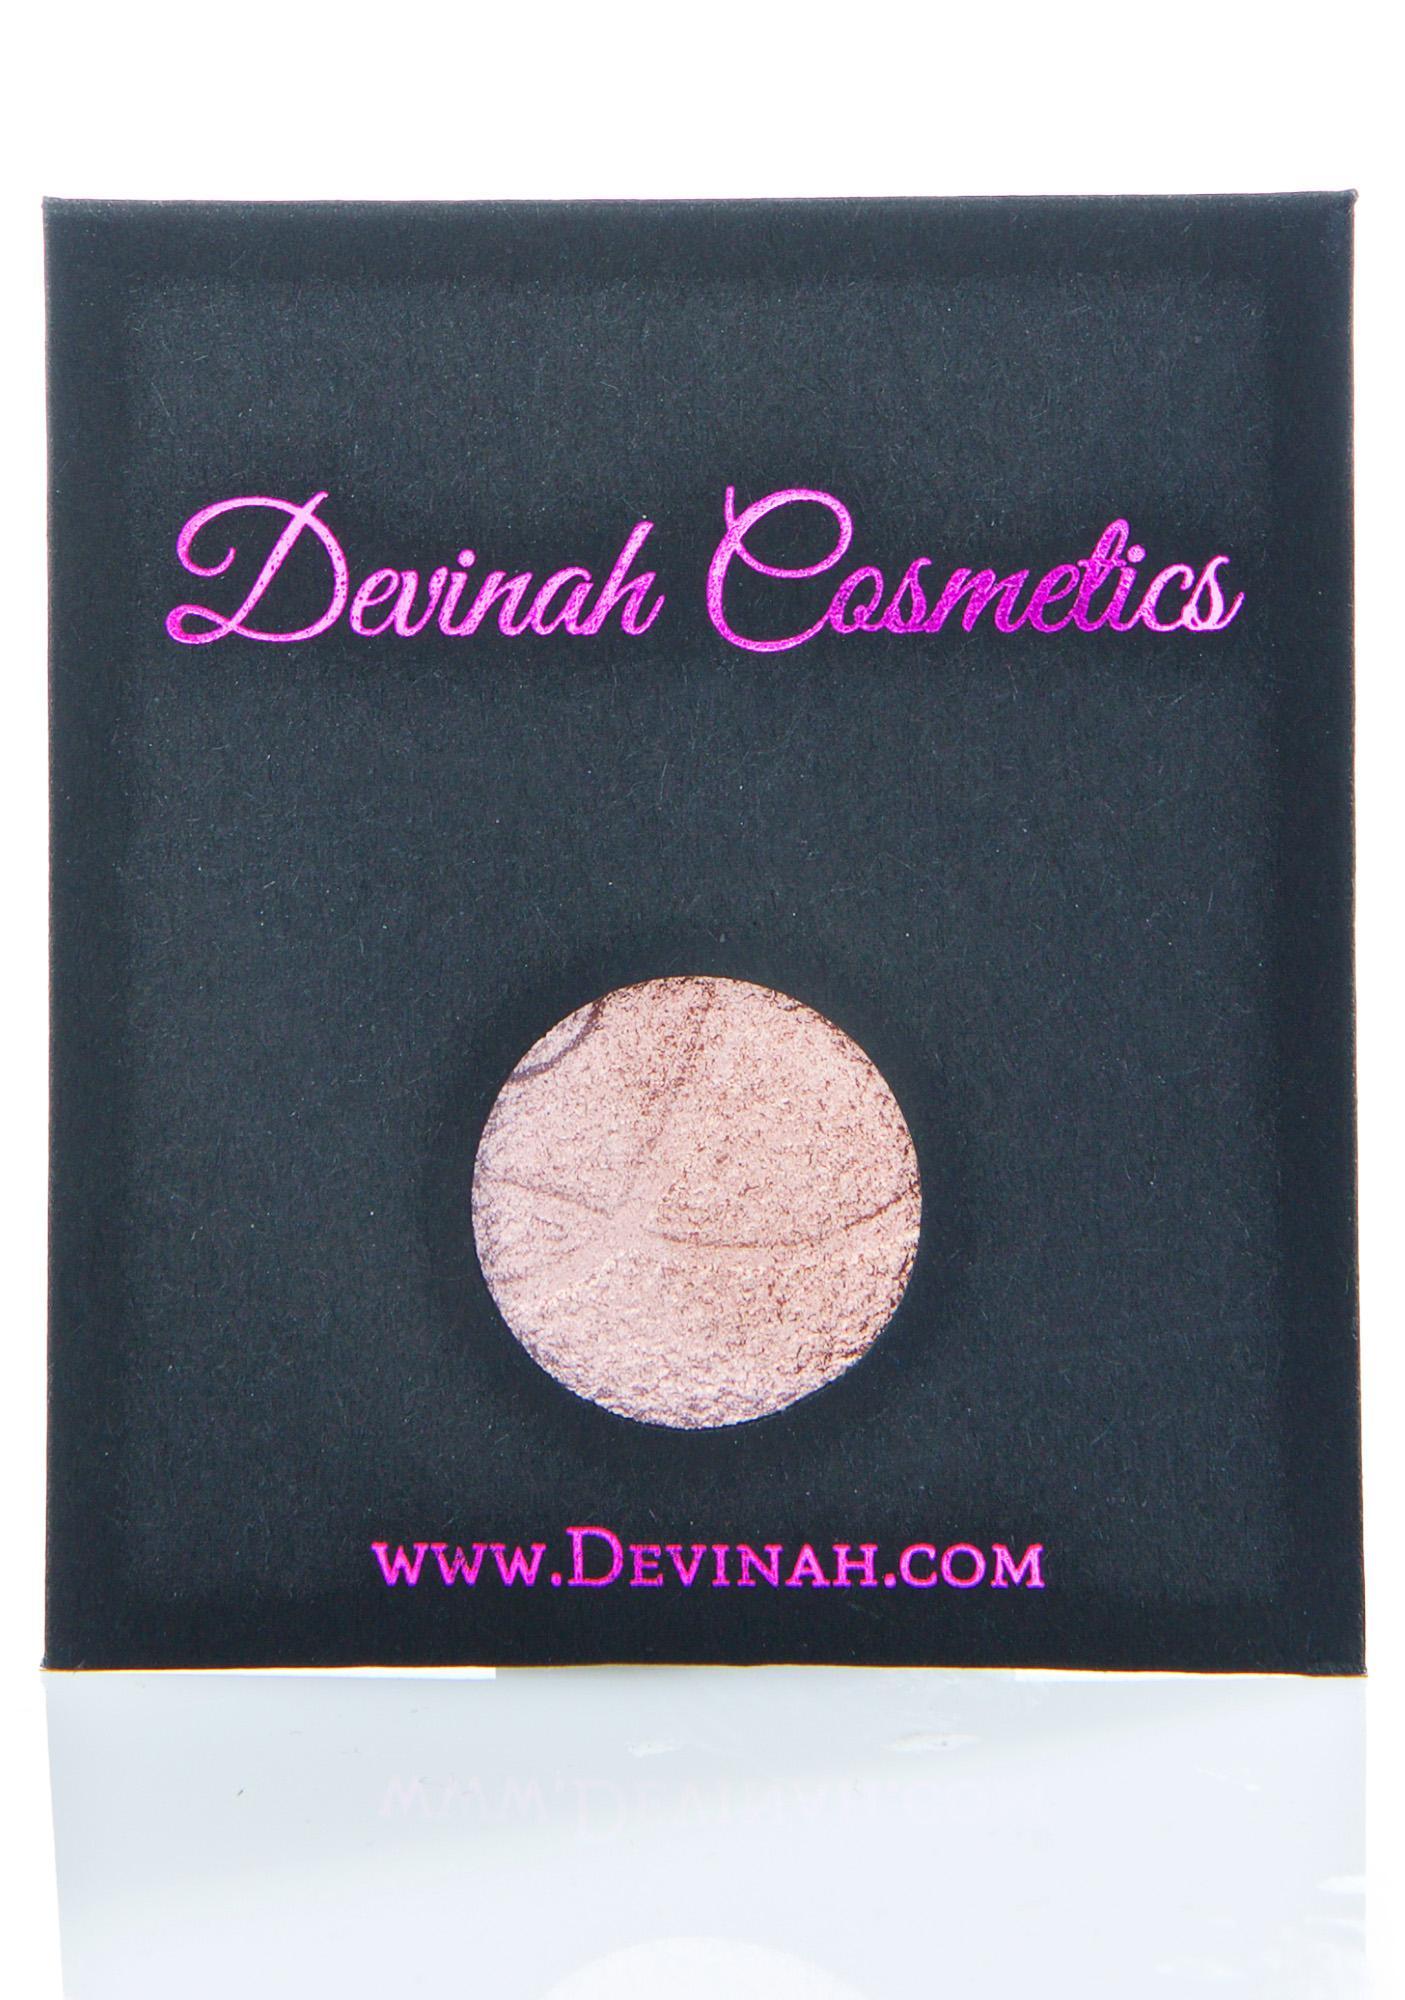 Devinah Cosmetics Fun Dip Highlighter